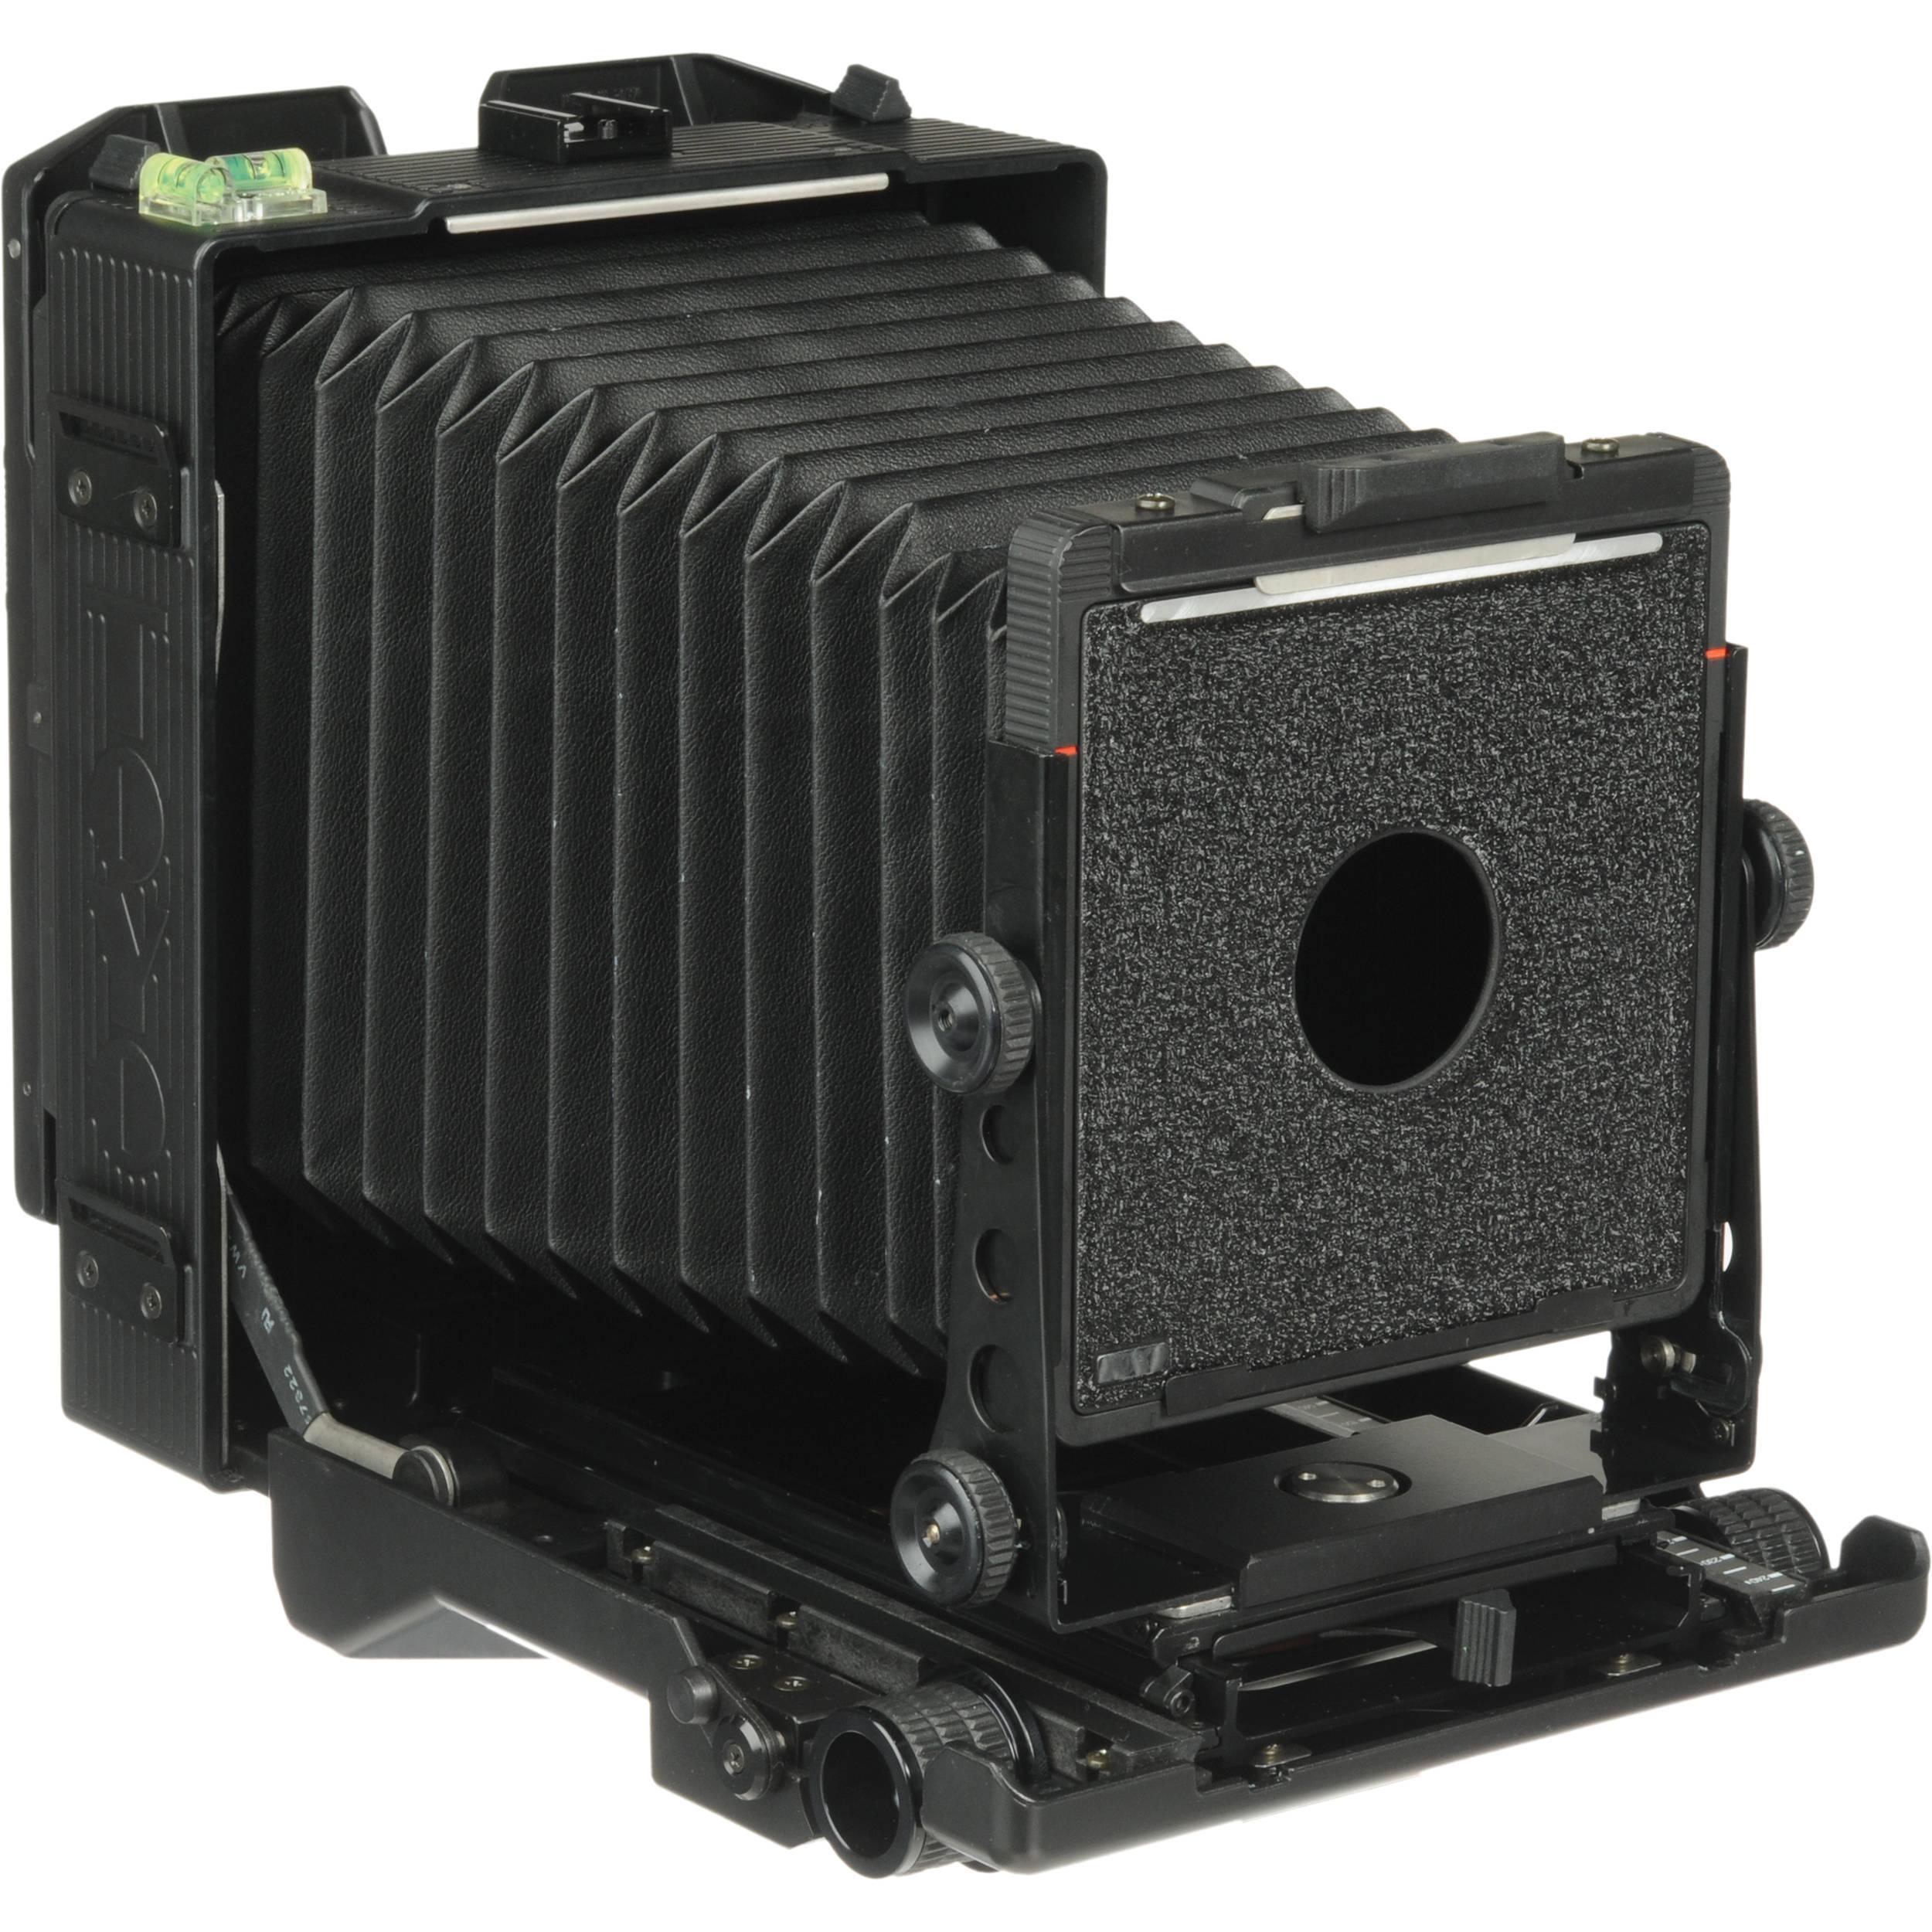 Toyo-View 4x5 45CF Field Camera 180-106 B&H Photo Video